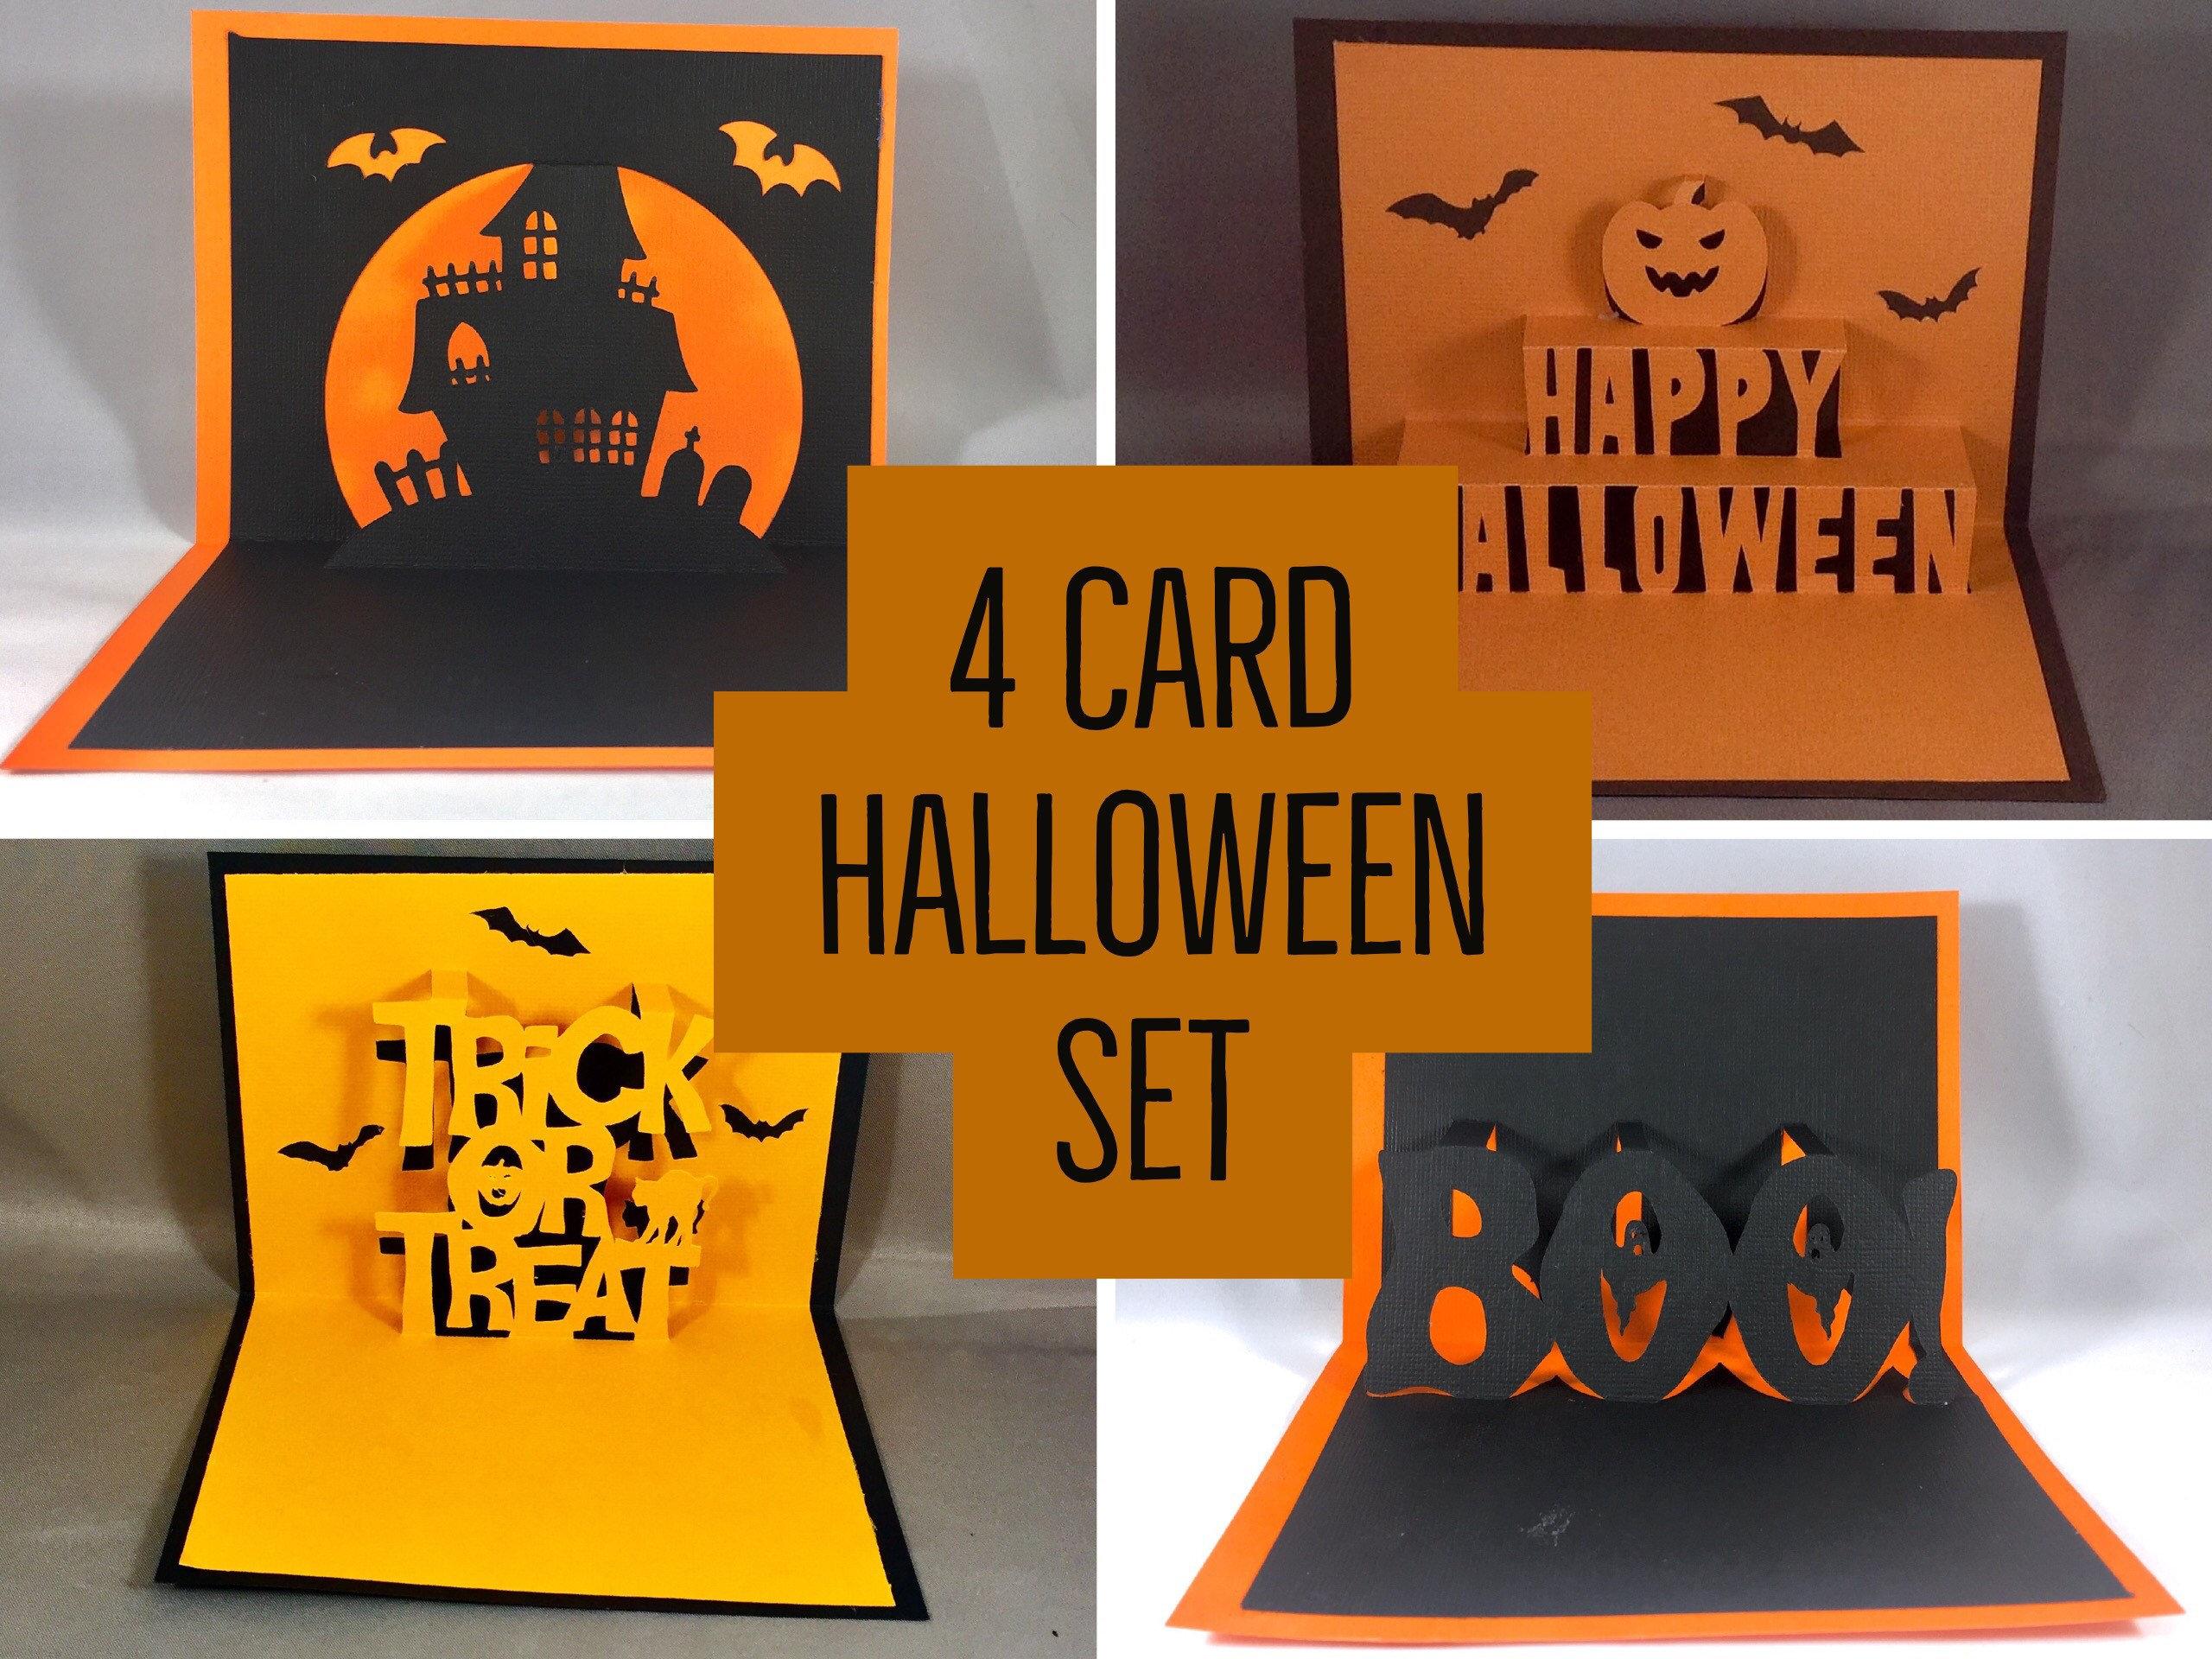 halloween pop up card happy halloween card set handmade halloween cards cute halloween card for kids funny halloween card handmade card